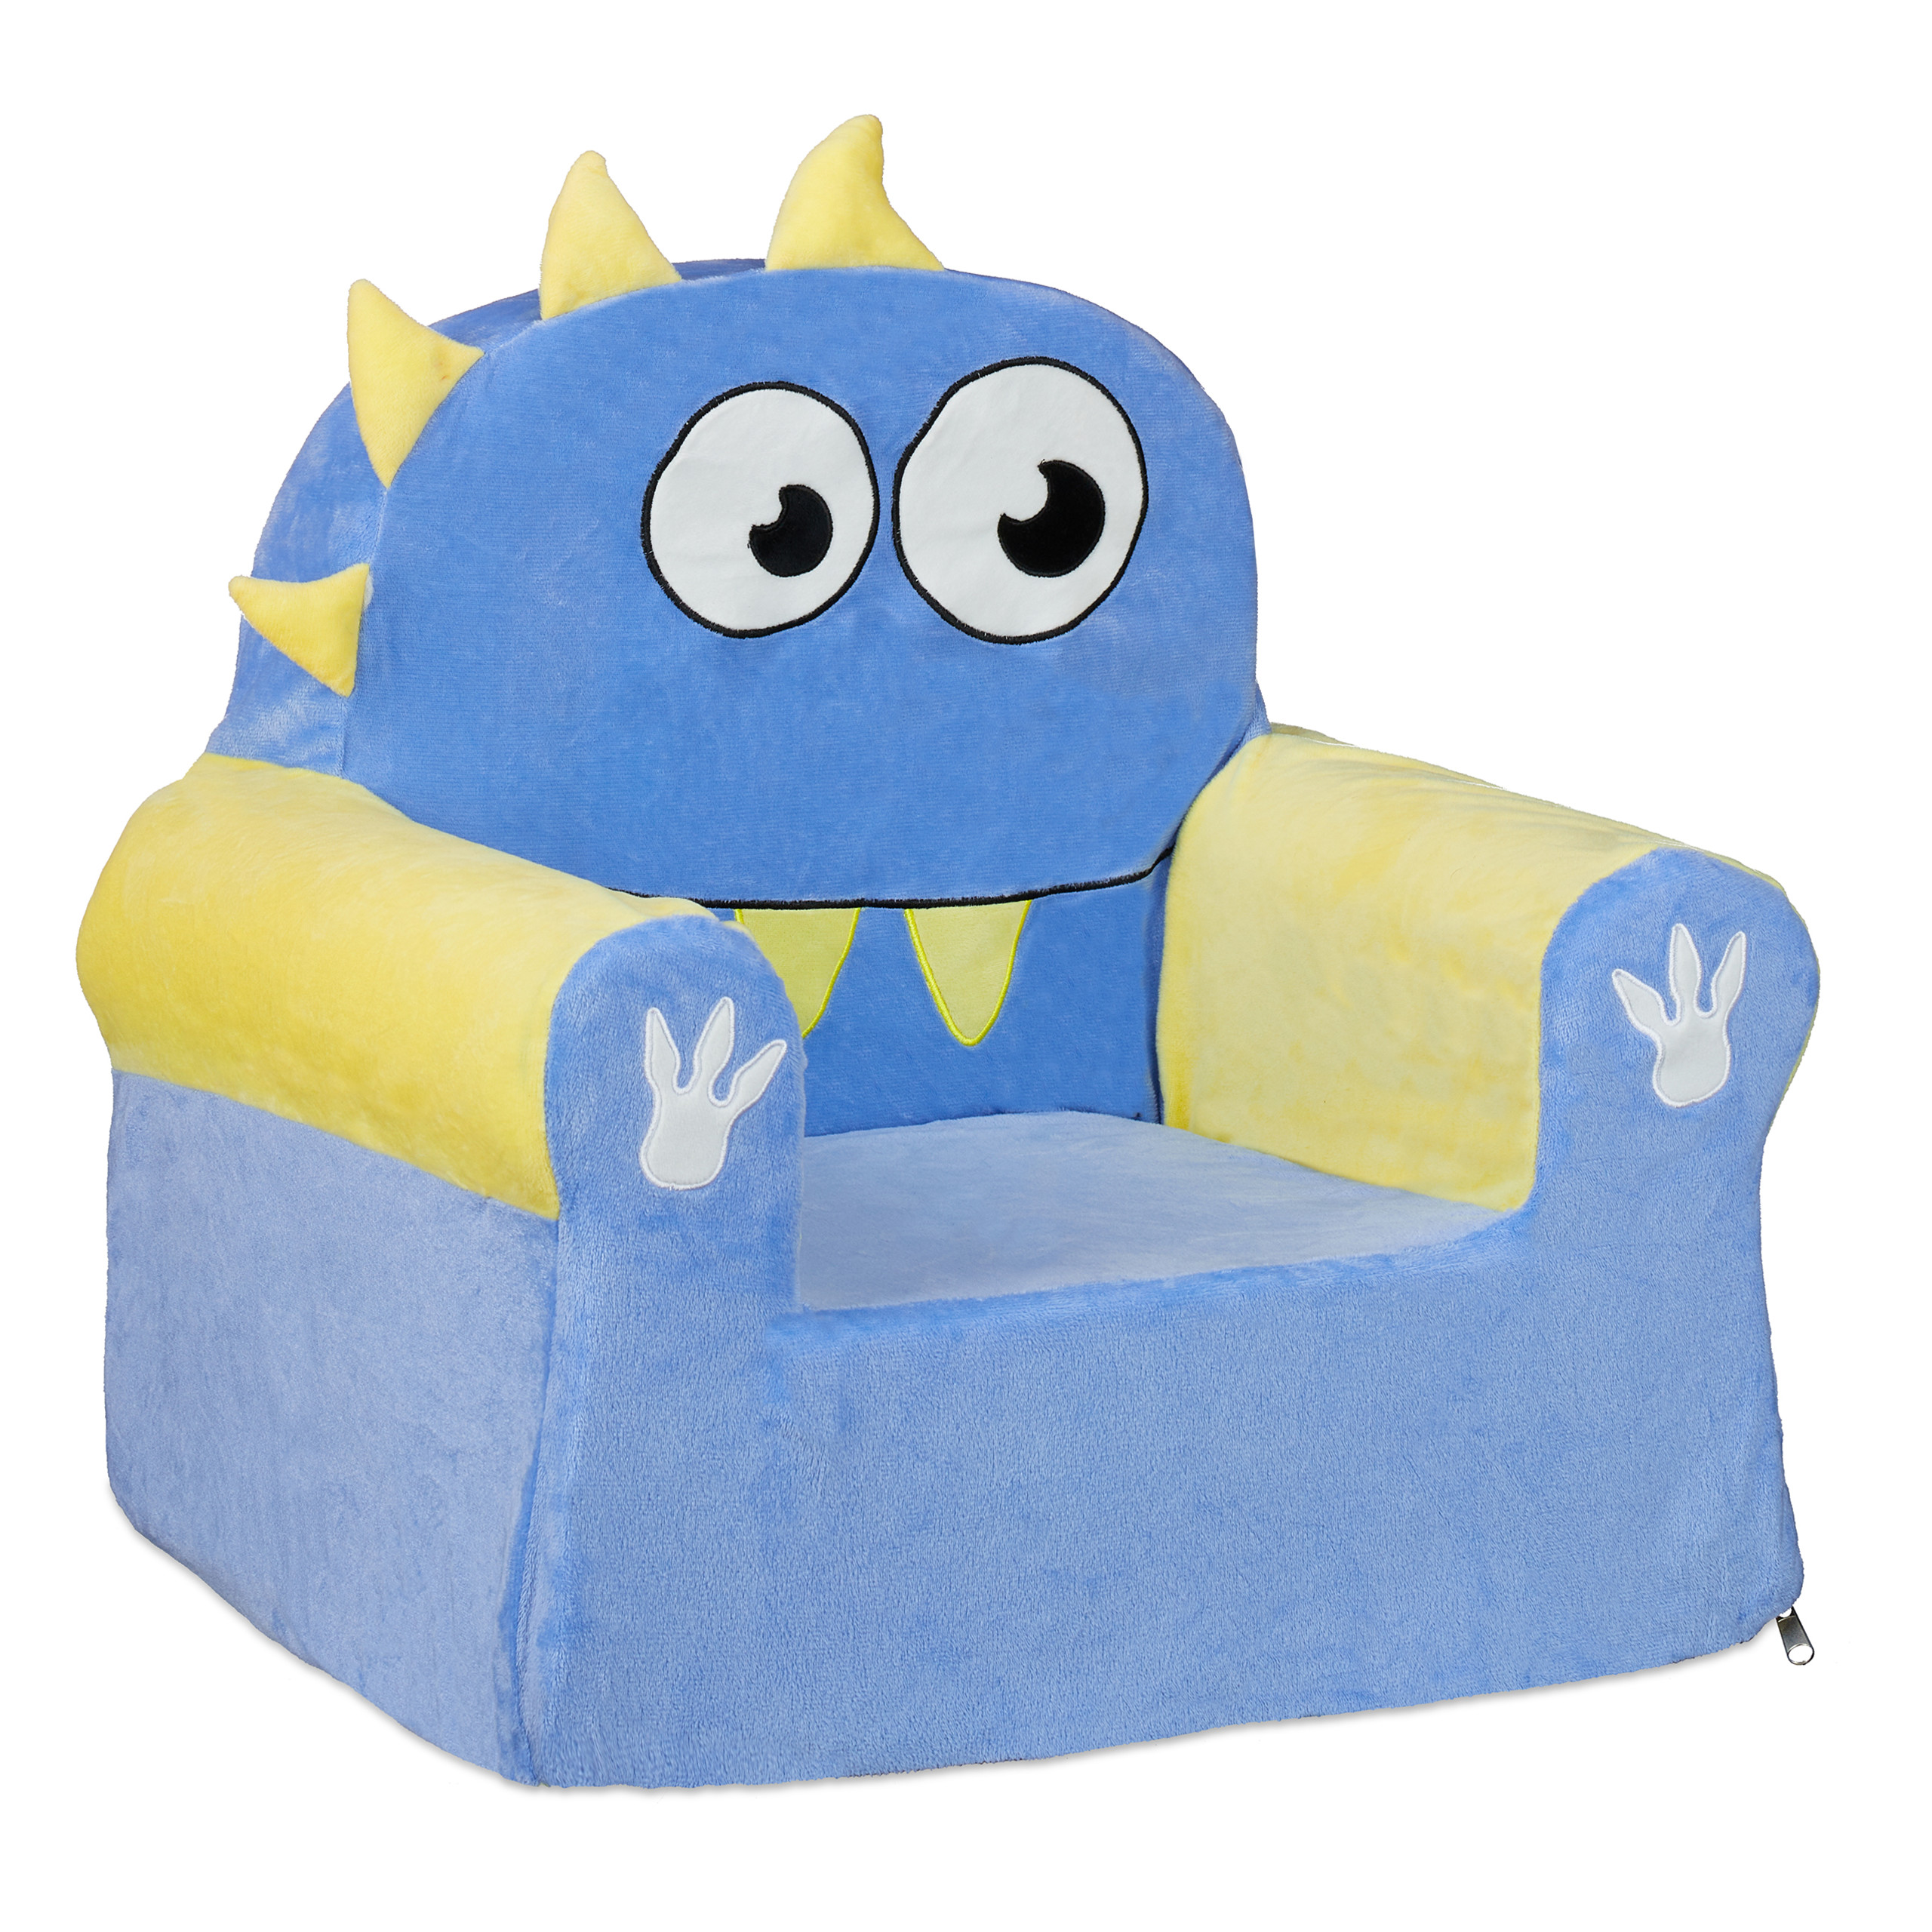 Poltrona per bambini poltroncina sedia seduta comoda mini ...